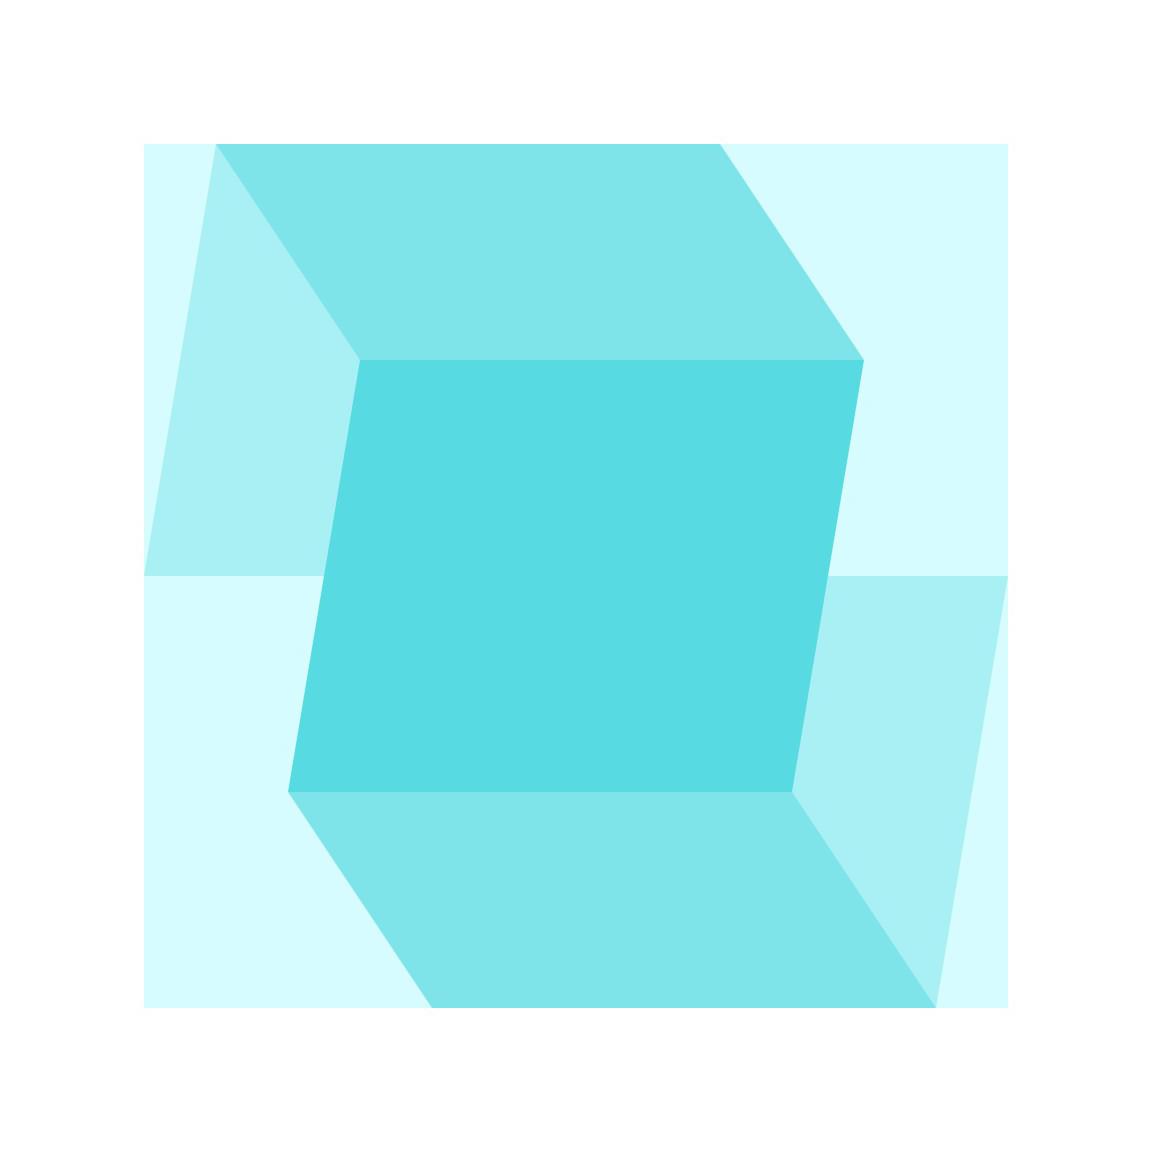 logo 264